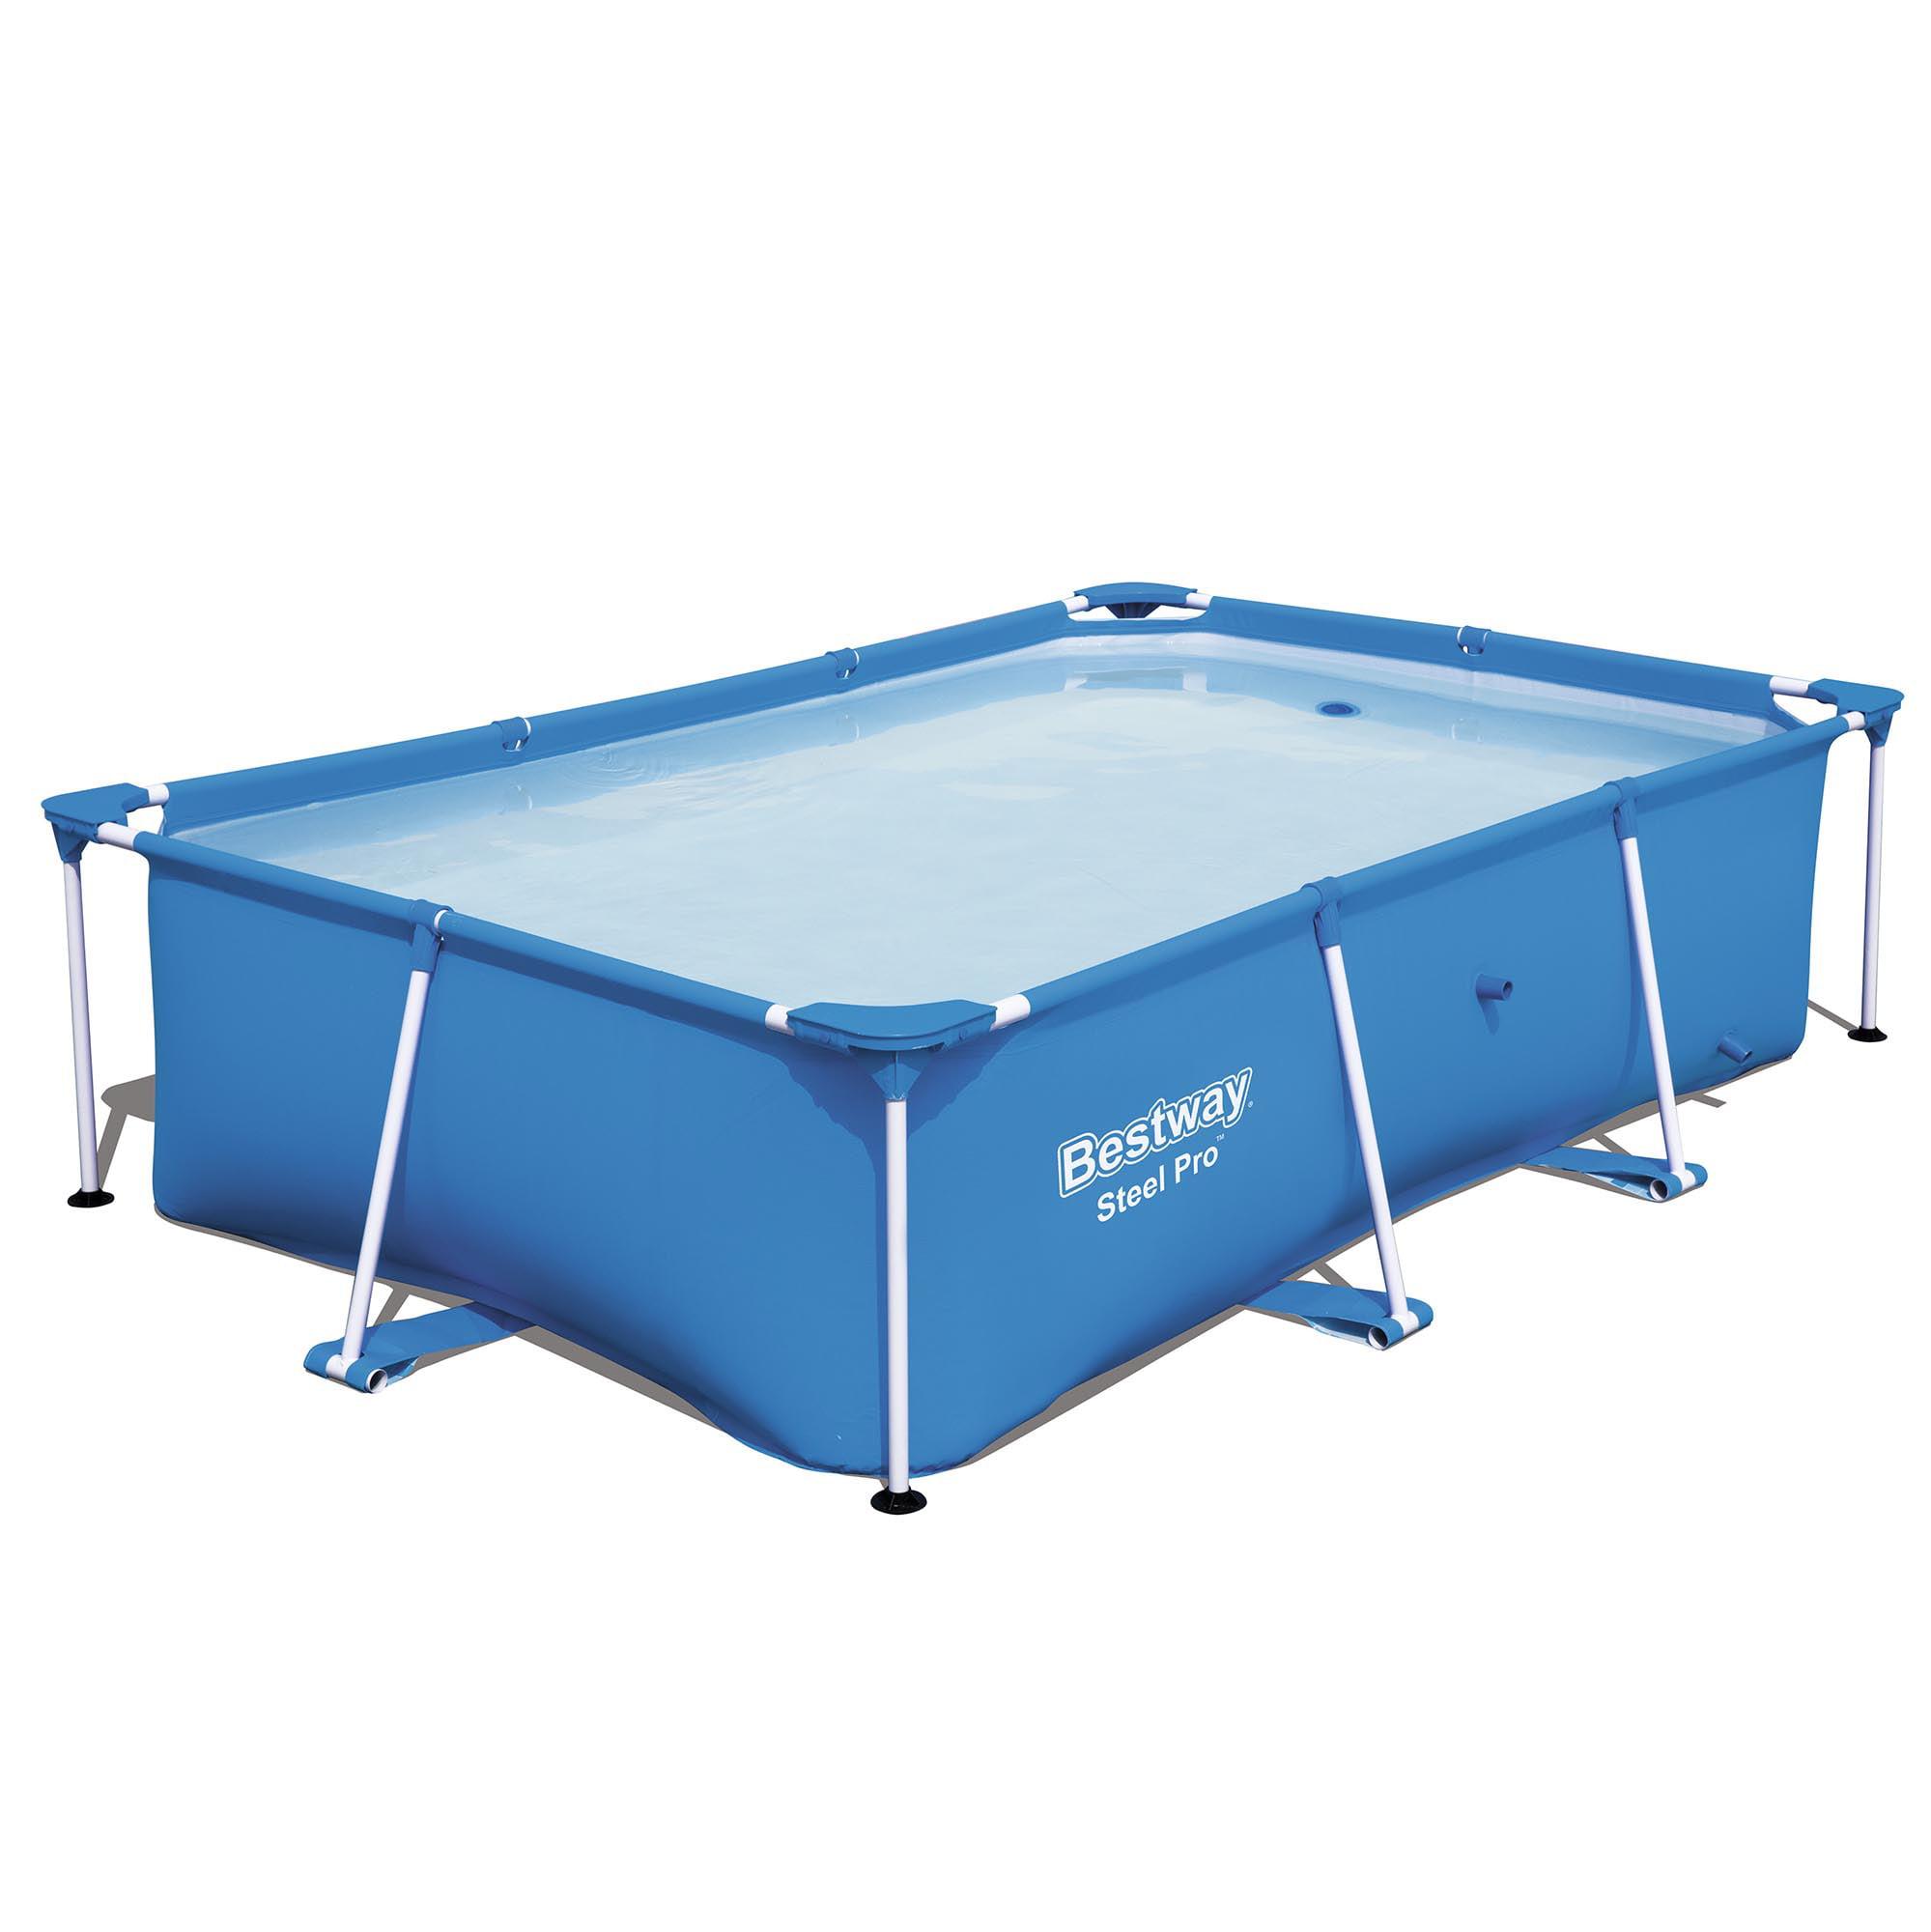 "Bestway Steel Pro 102 x 67 x 24"" Rectangular Frame Above Ground Swimming Pool"